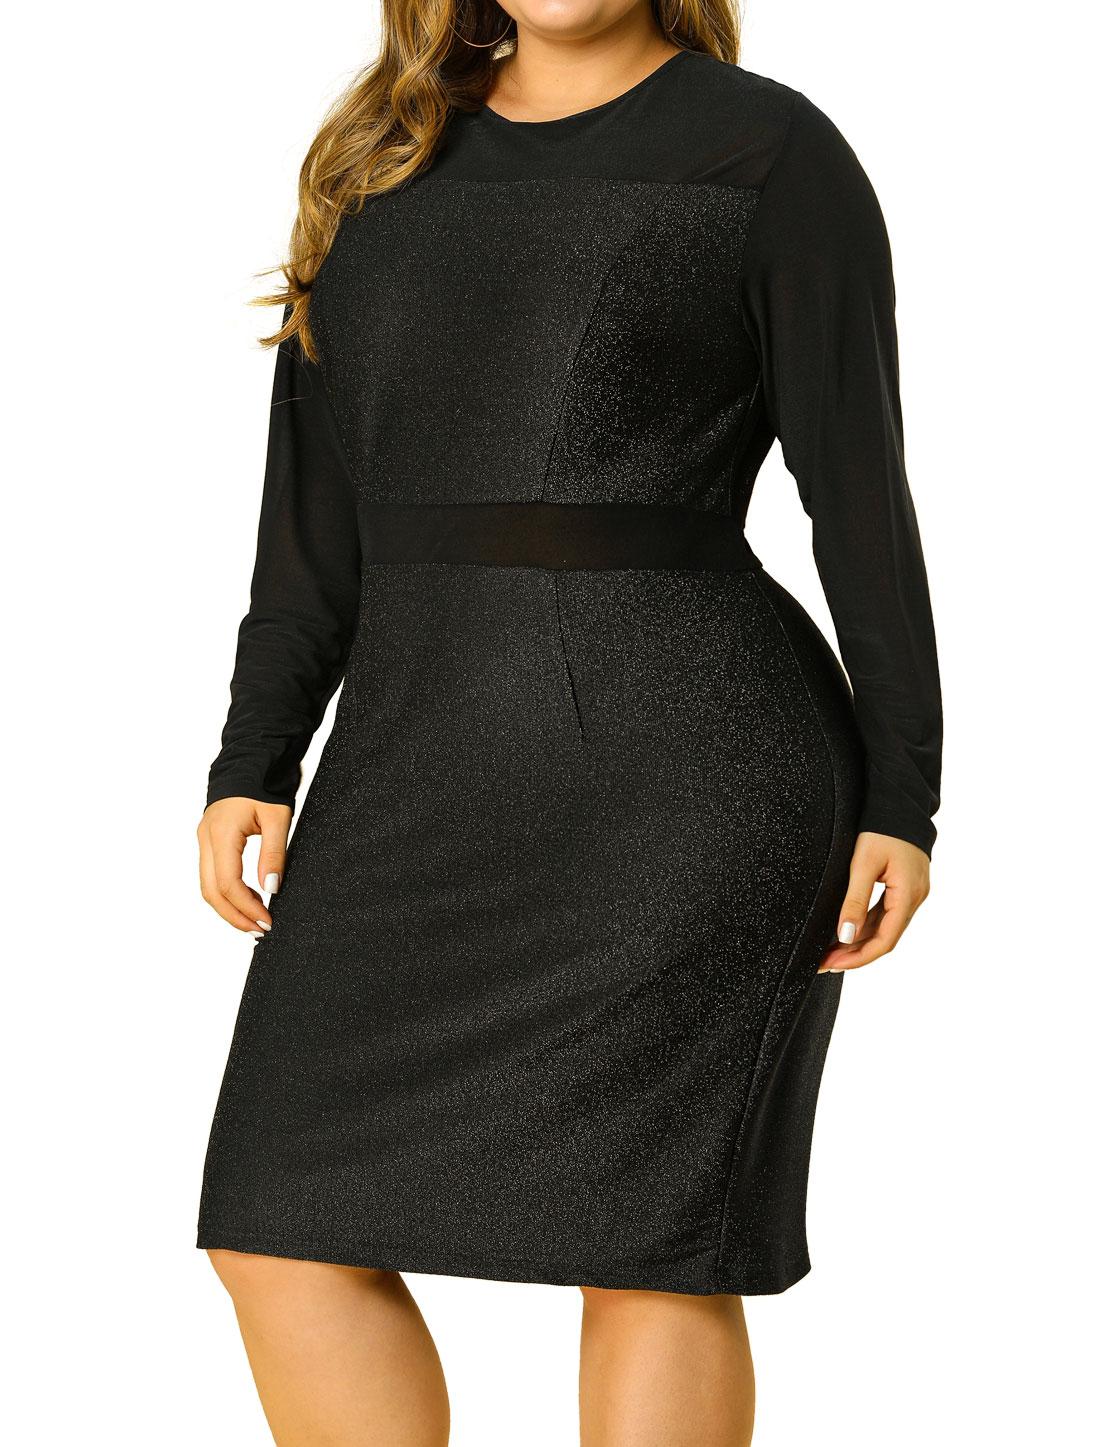 Women's Plus Size Above Knee Semi Sheer Mesh Sleeve Party Dress Black 4X